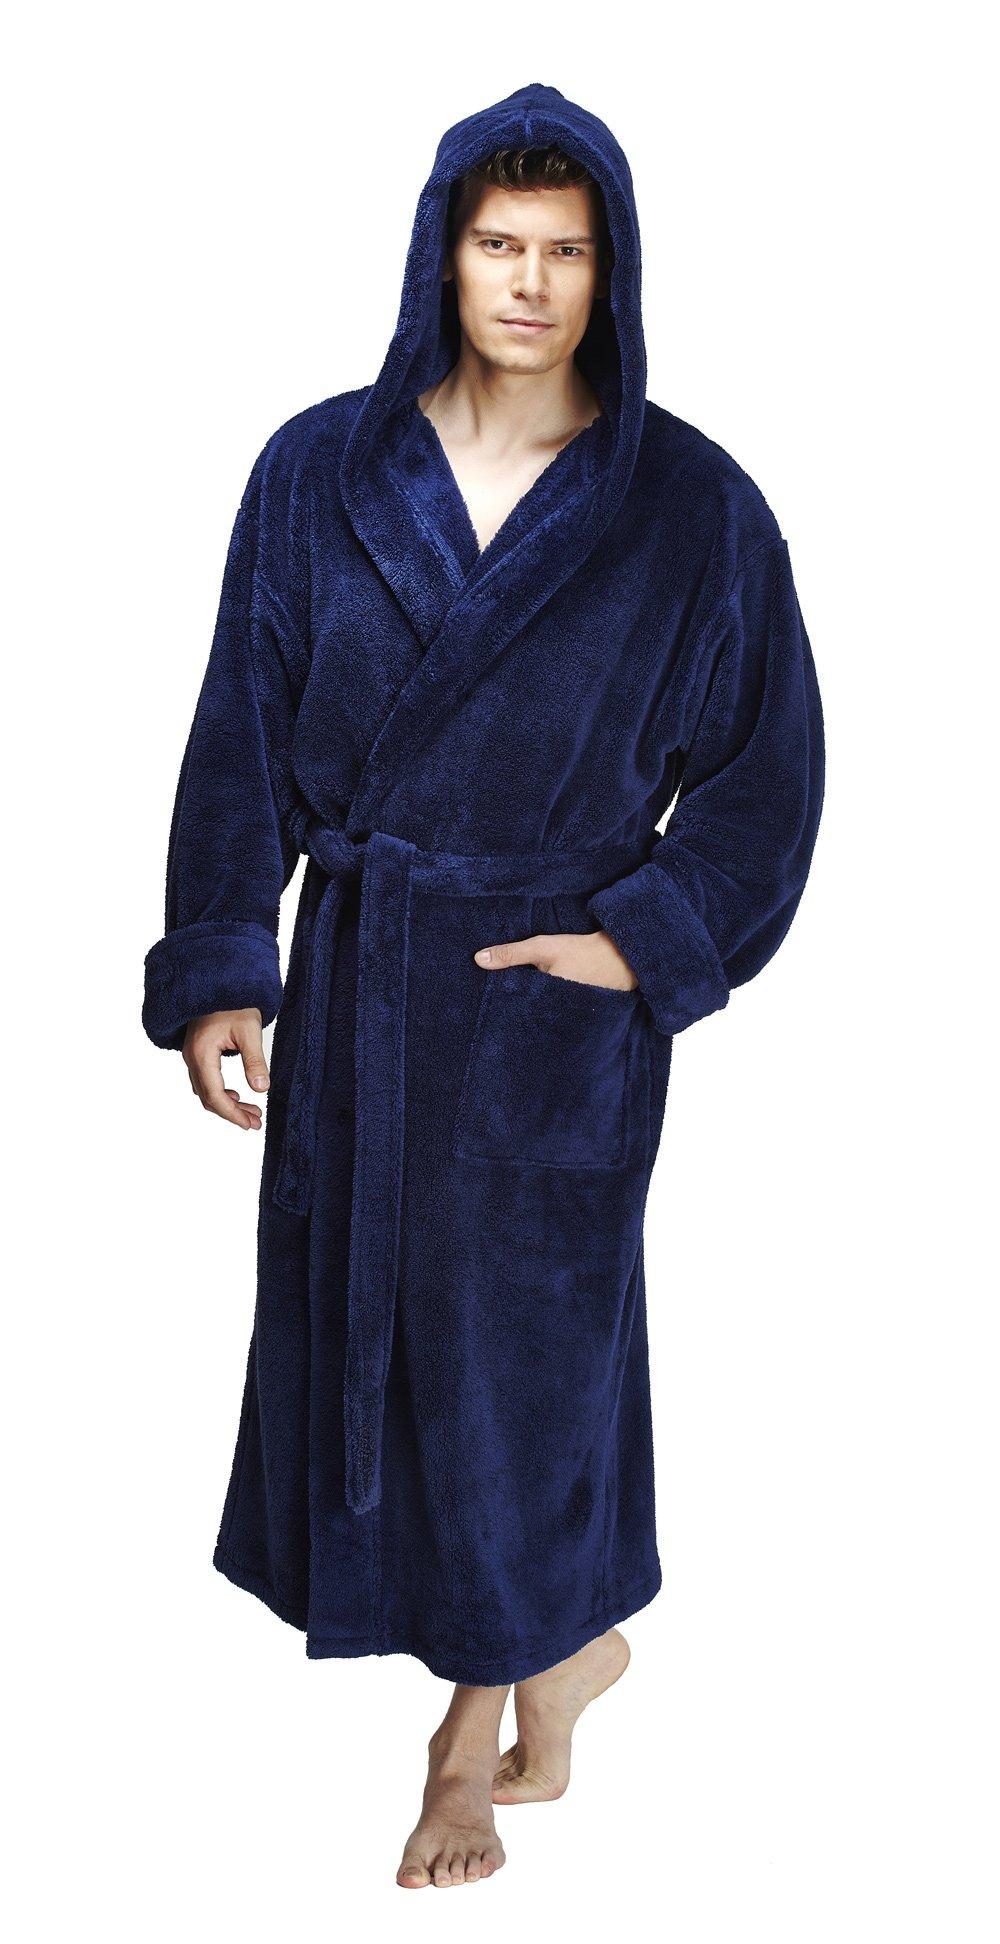 Arus Men's Hooded Fleece Bathrobe Turkish Soft Plush Robe, Navy Blue, SM